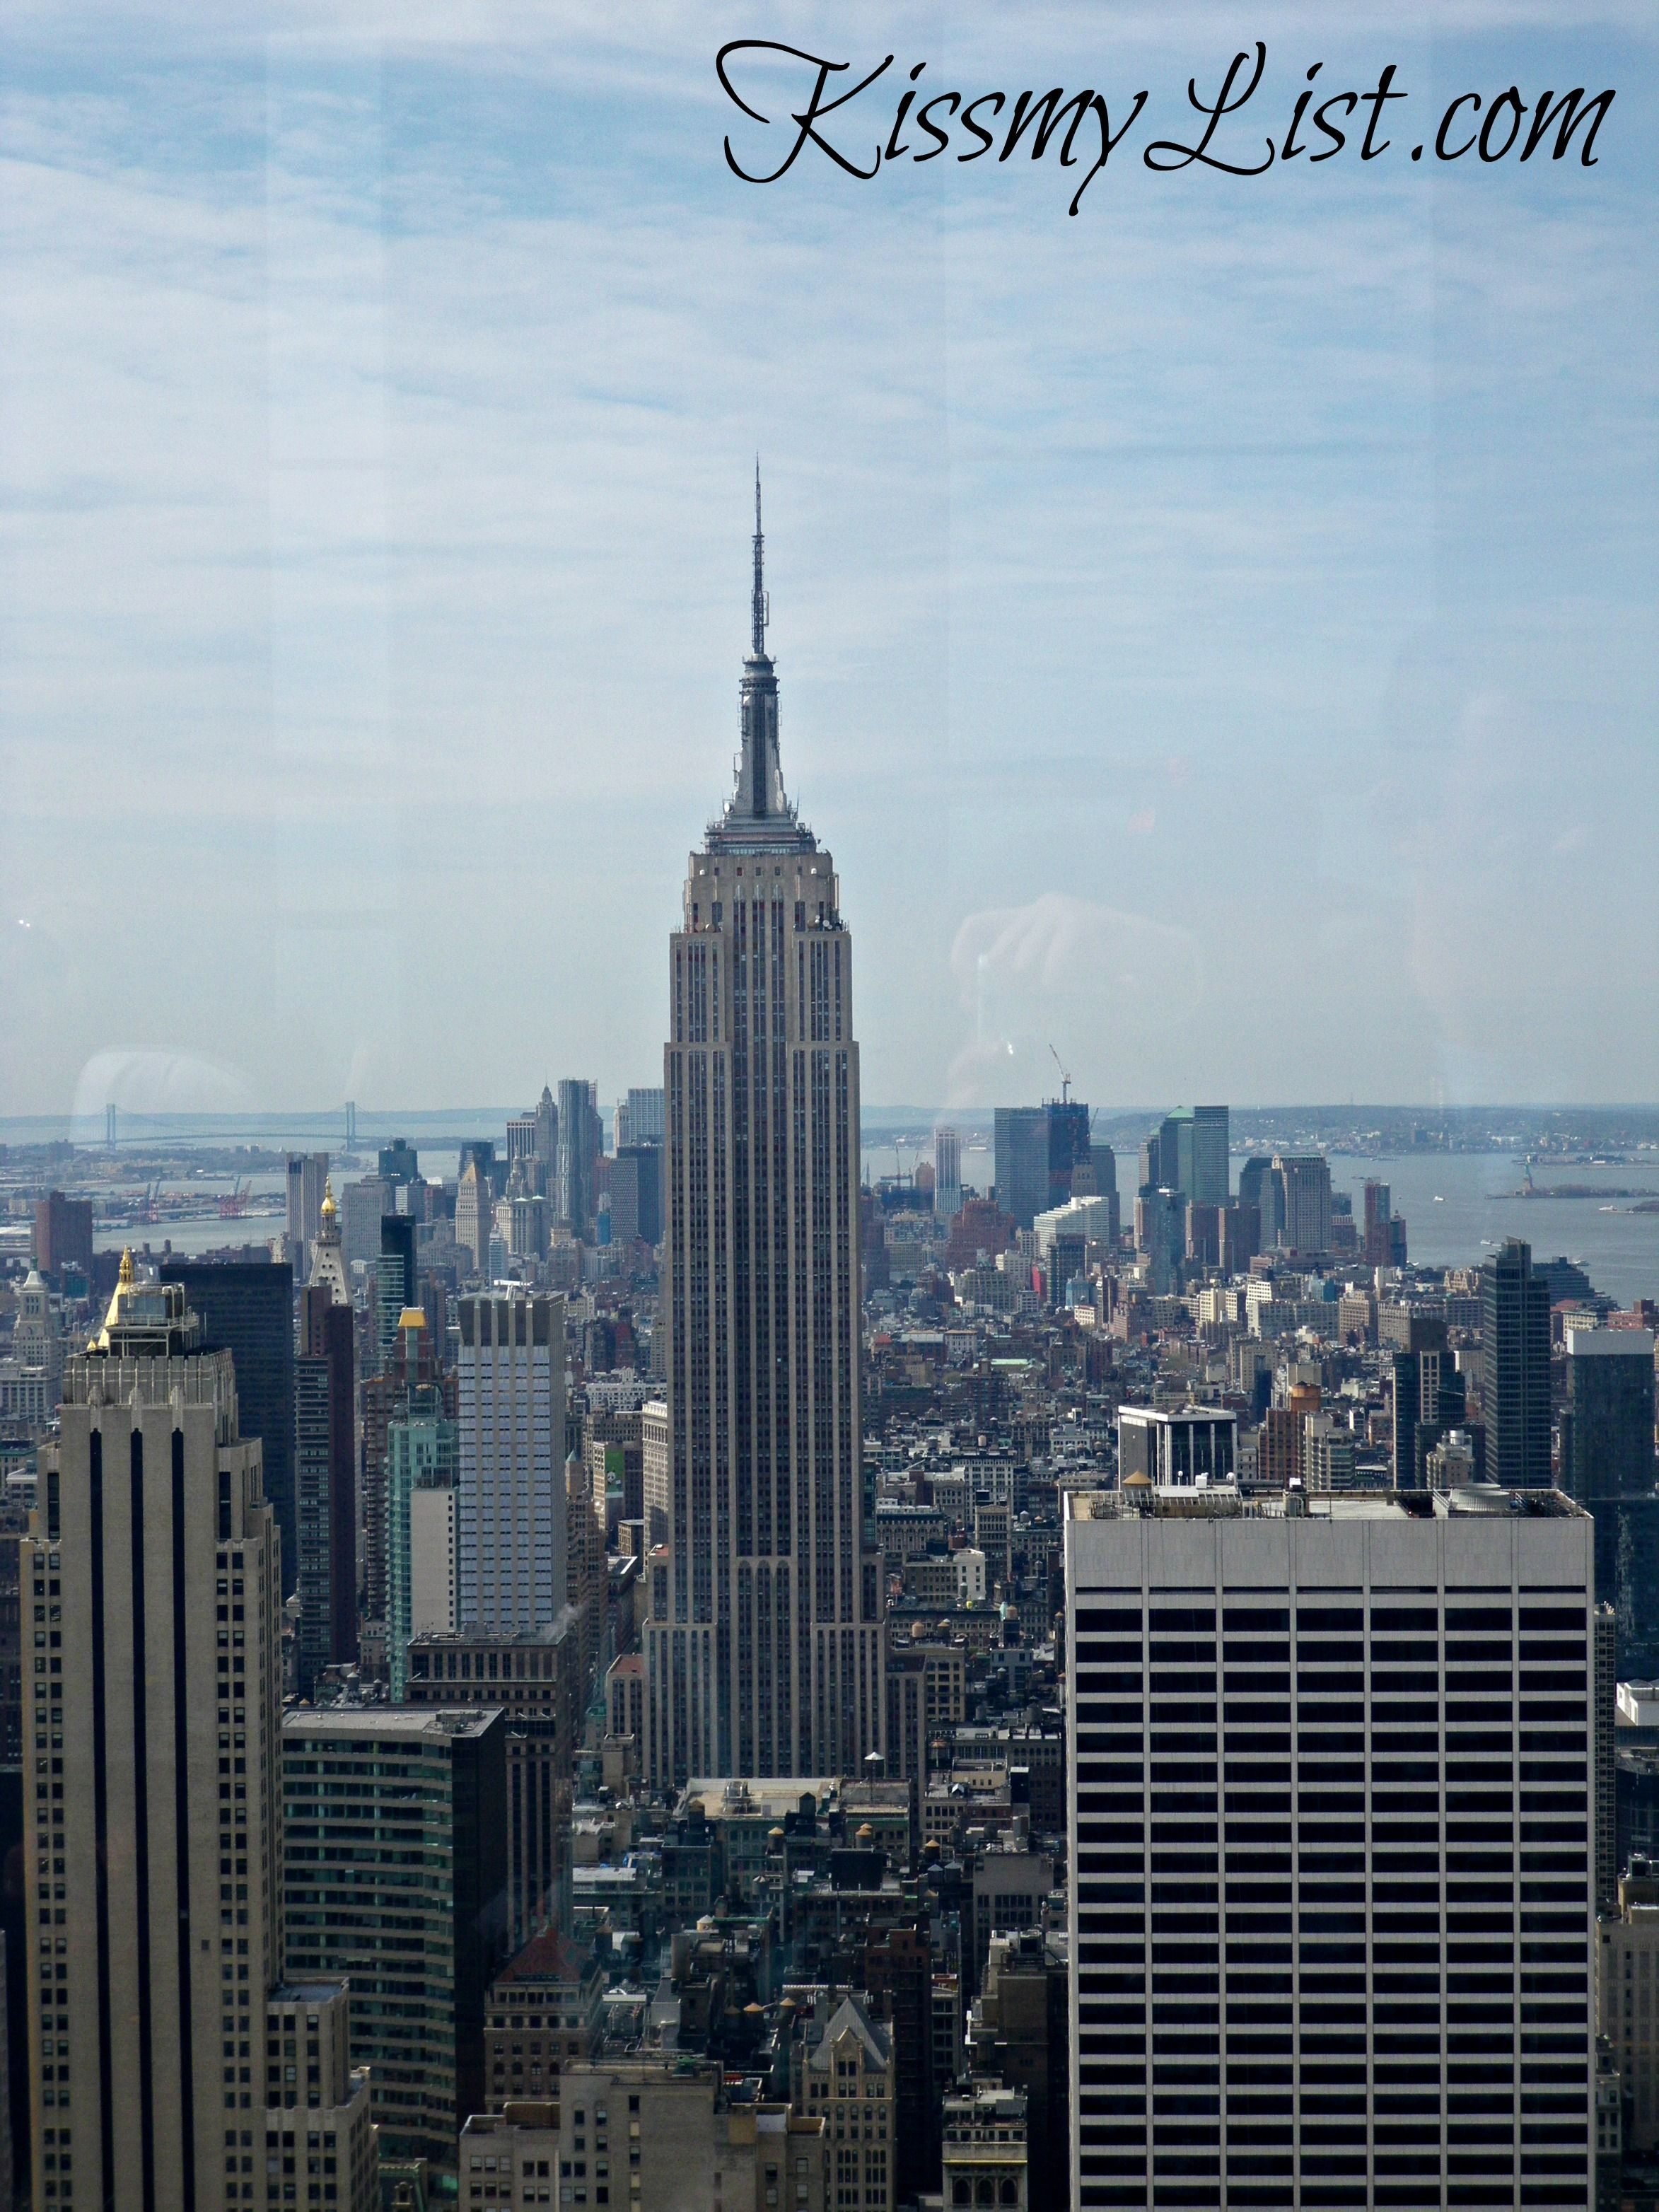 New York City Hd Wallpaper For Mobile